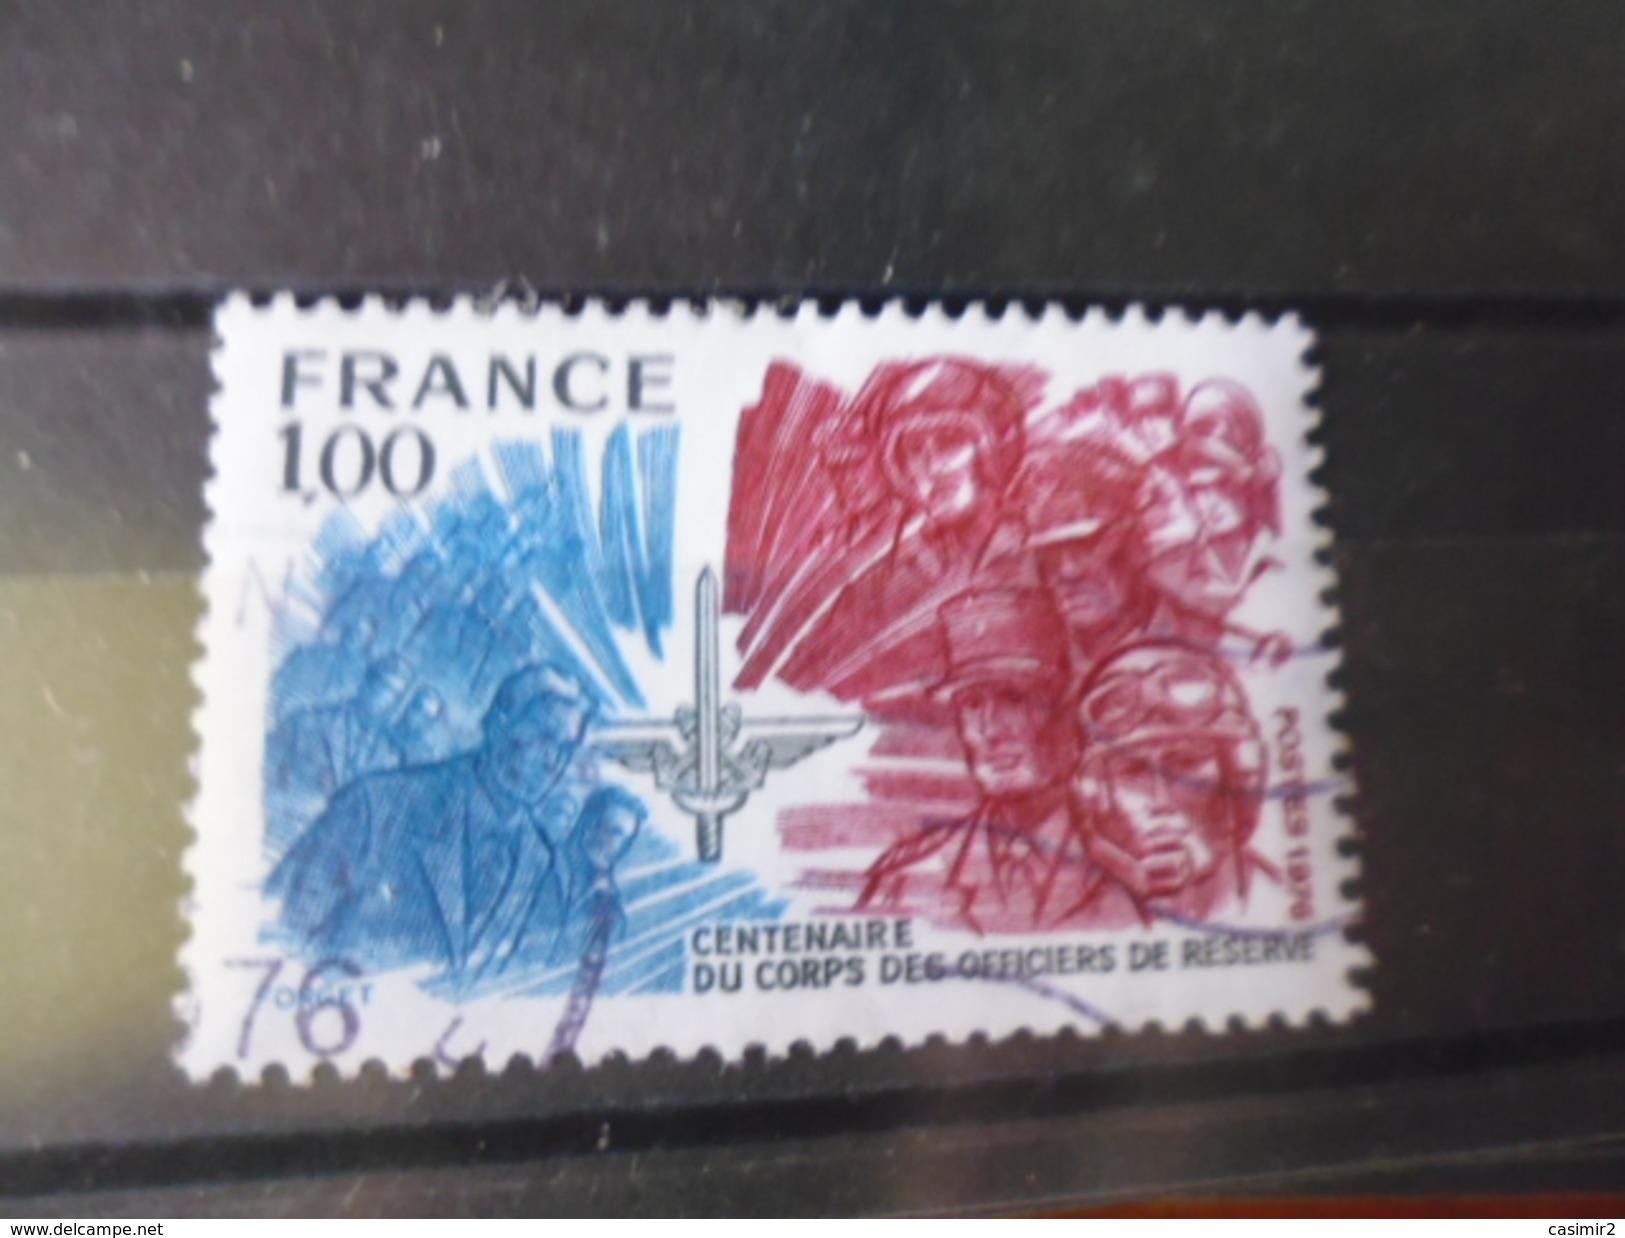 FRANCE OBLITERATION CHOISIE   YVERT N°1890 - Frankreich